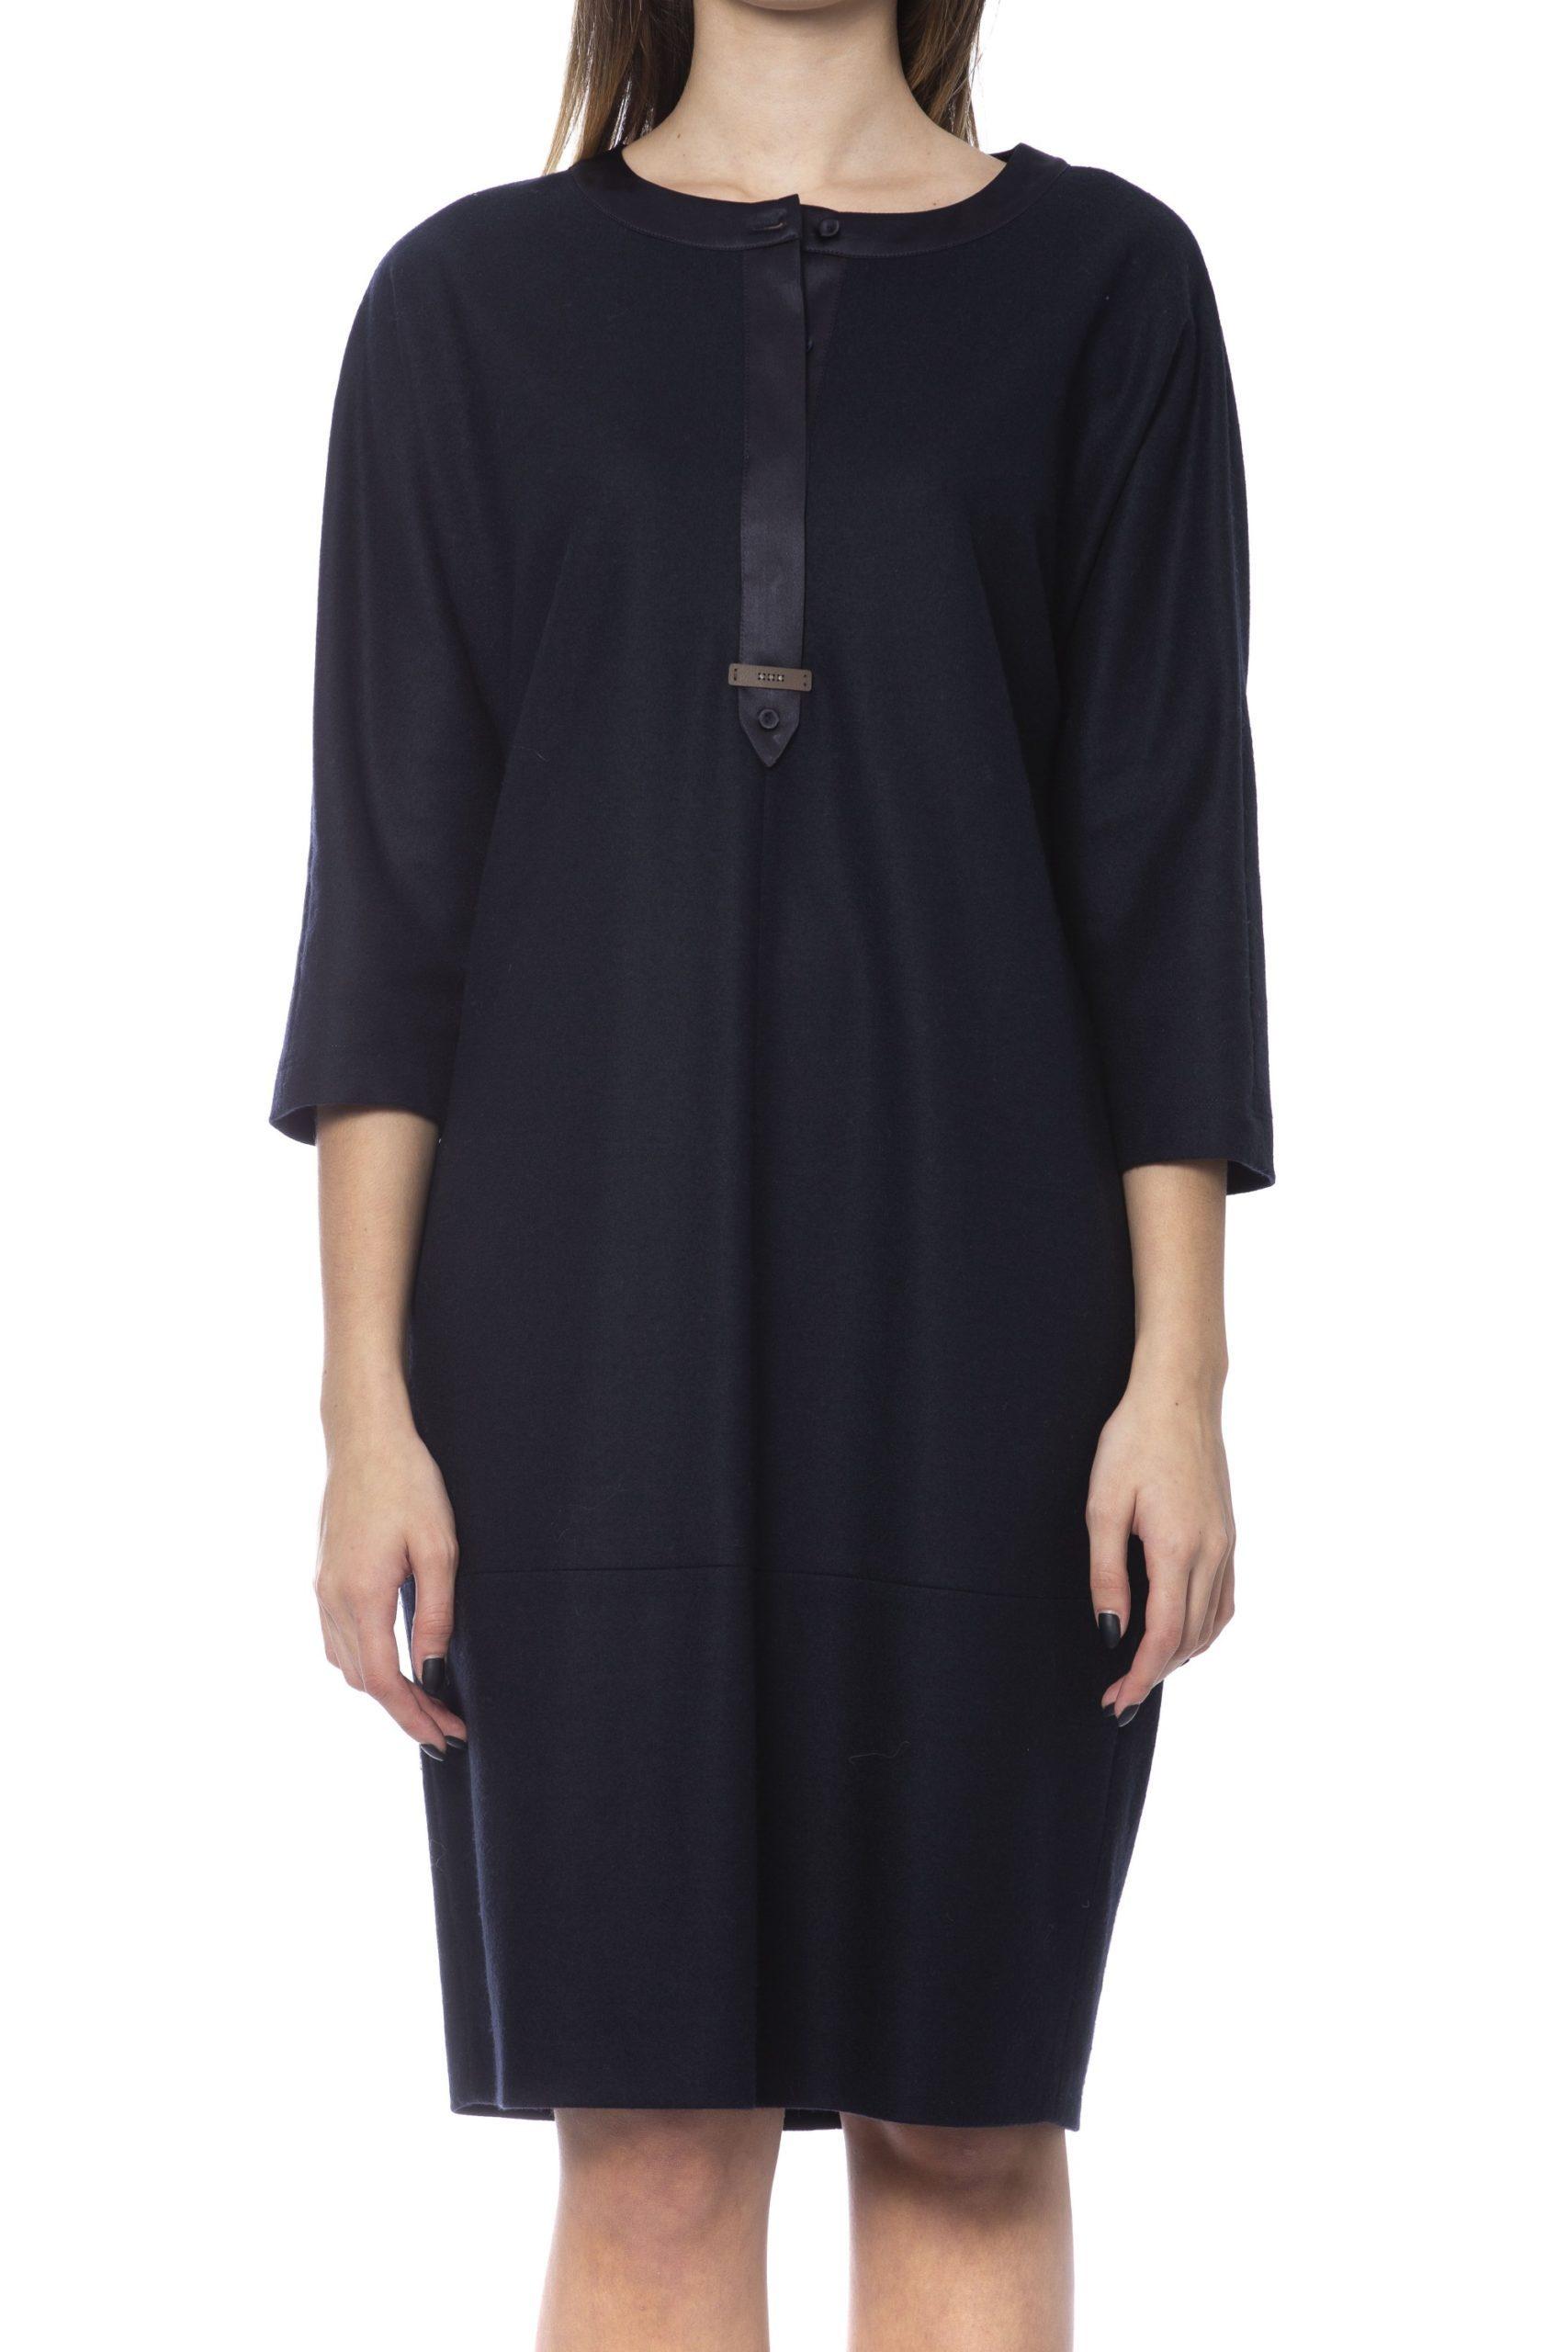 Peserico Women's Dress Black PE992196 - IT42 | S